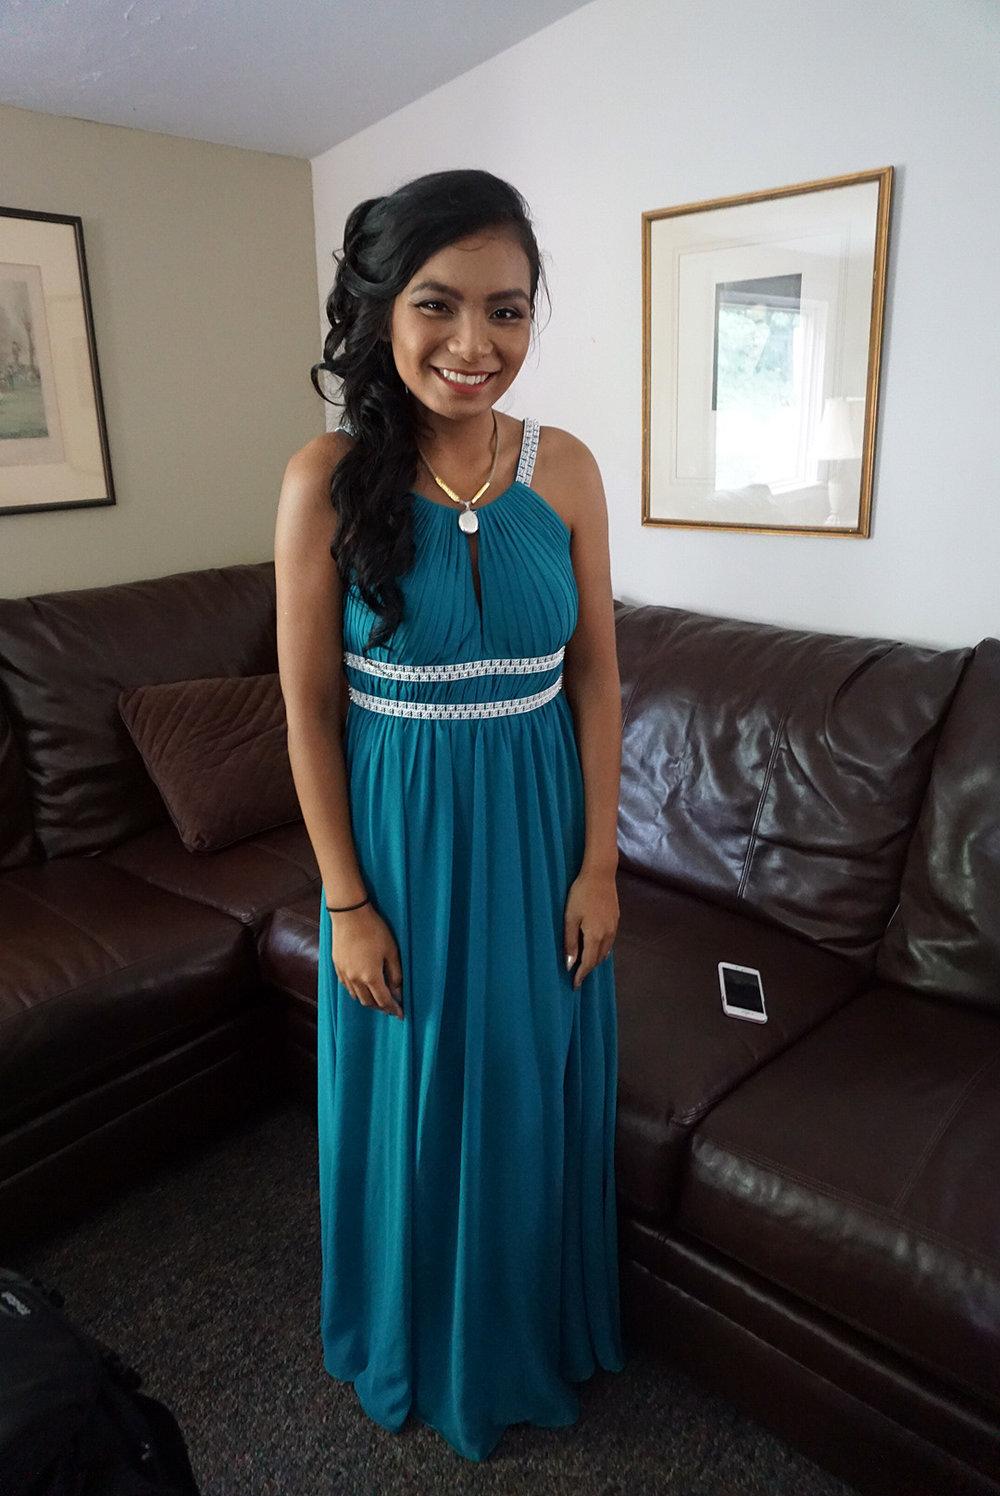 Teal-Bridesmaid-Dress-Summer-Style-Blogger-LINDATENCHITRAN-2-1616x1080.jpg